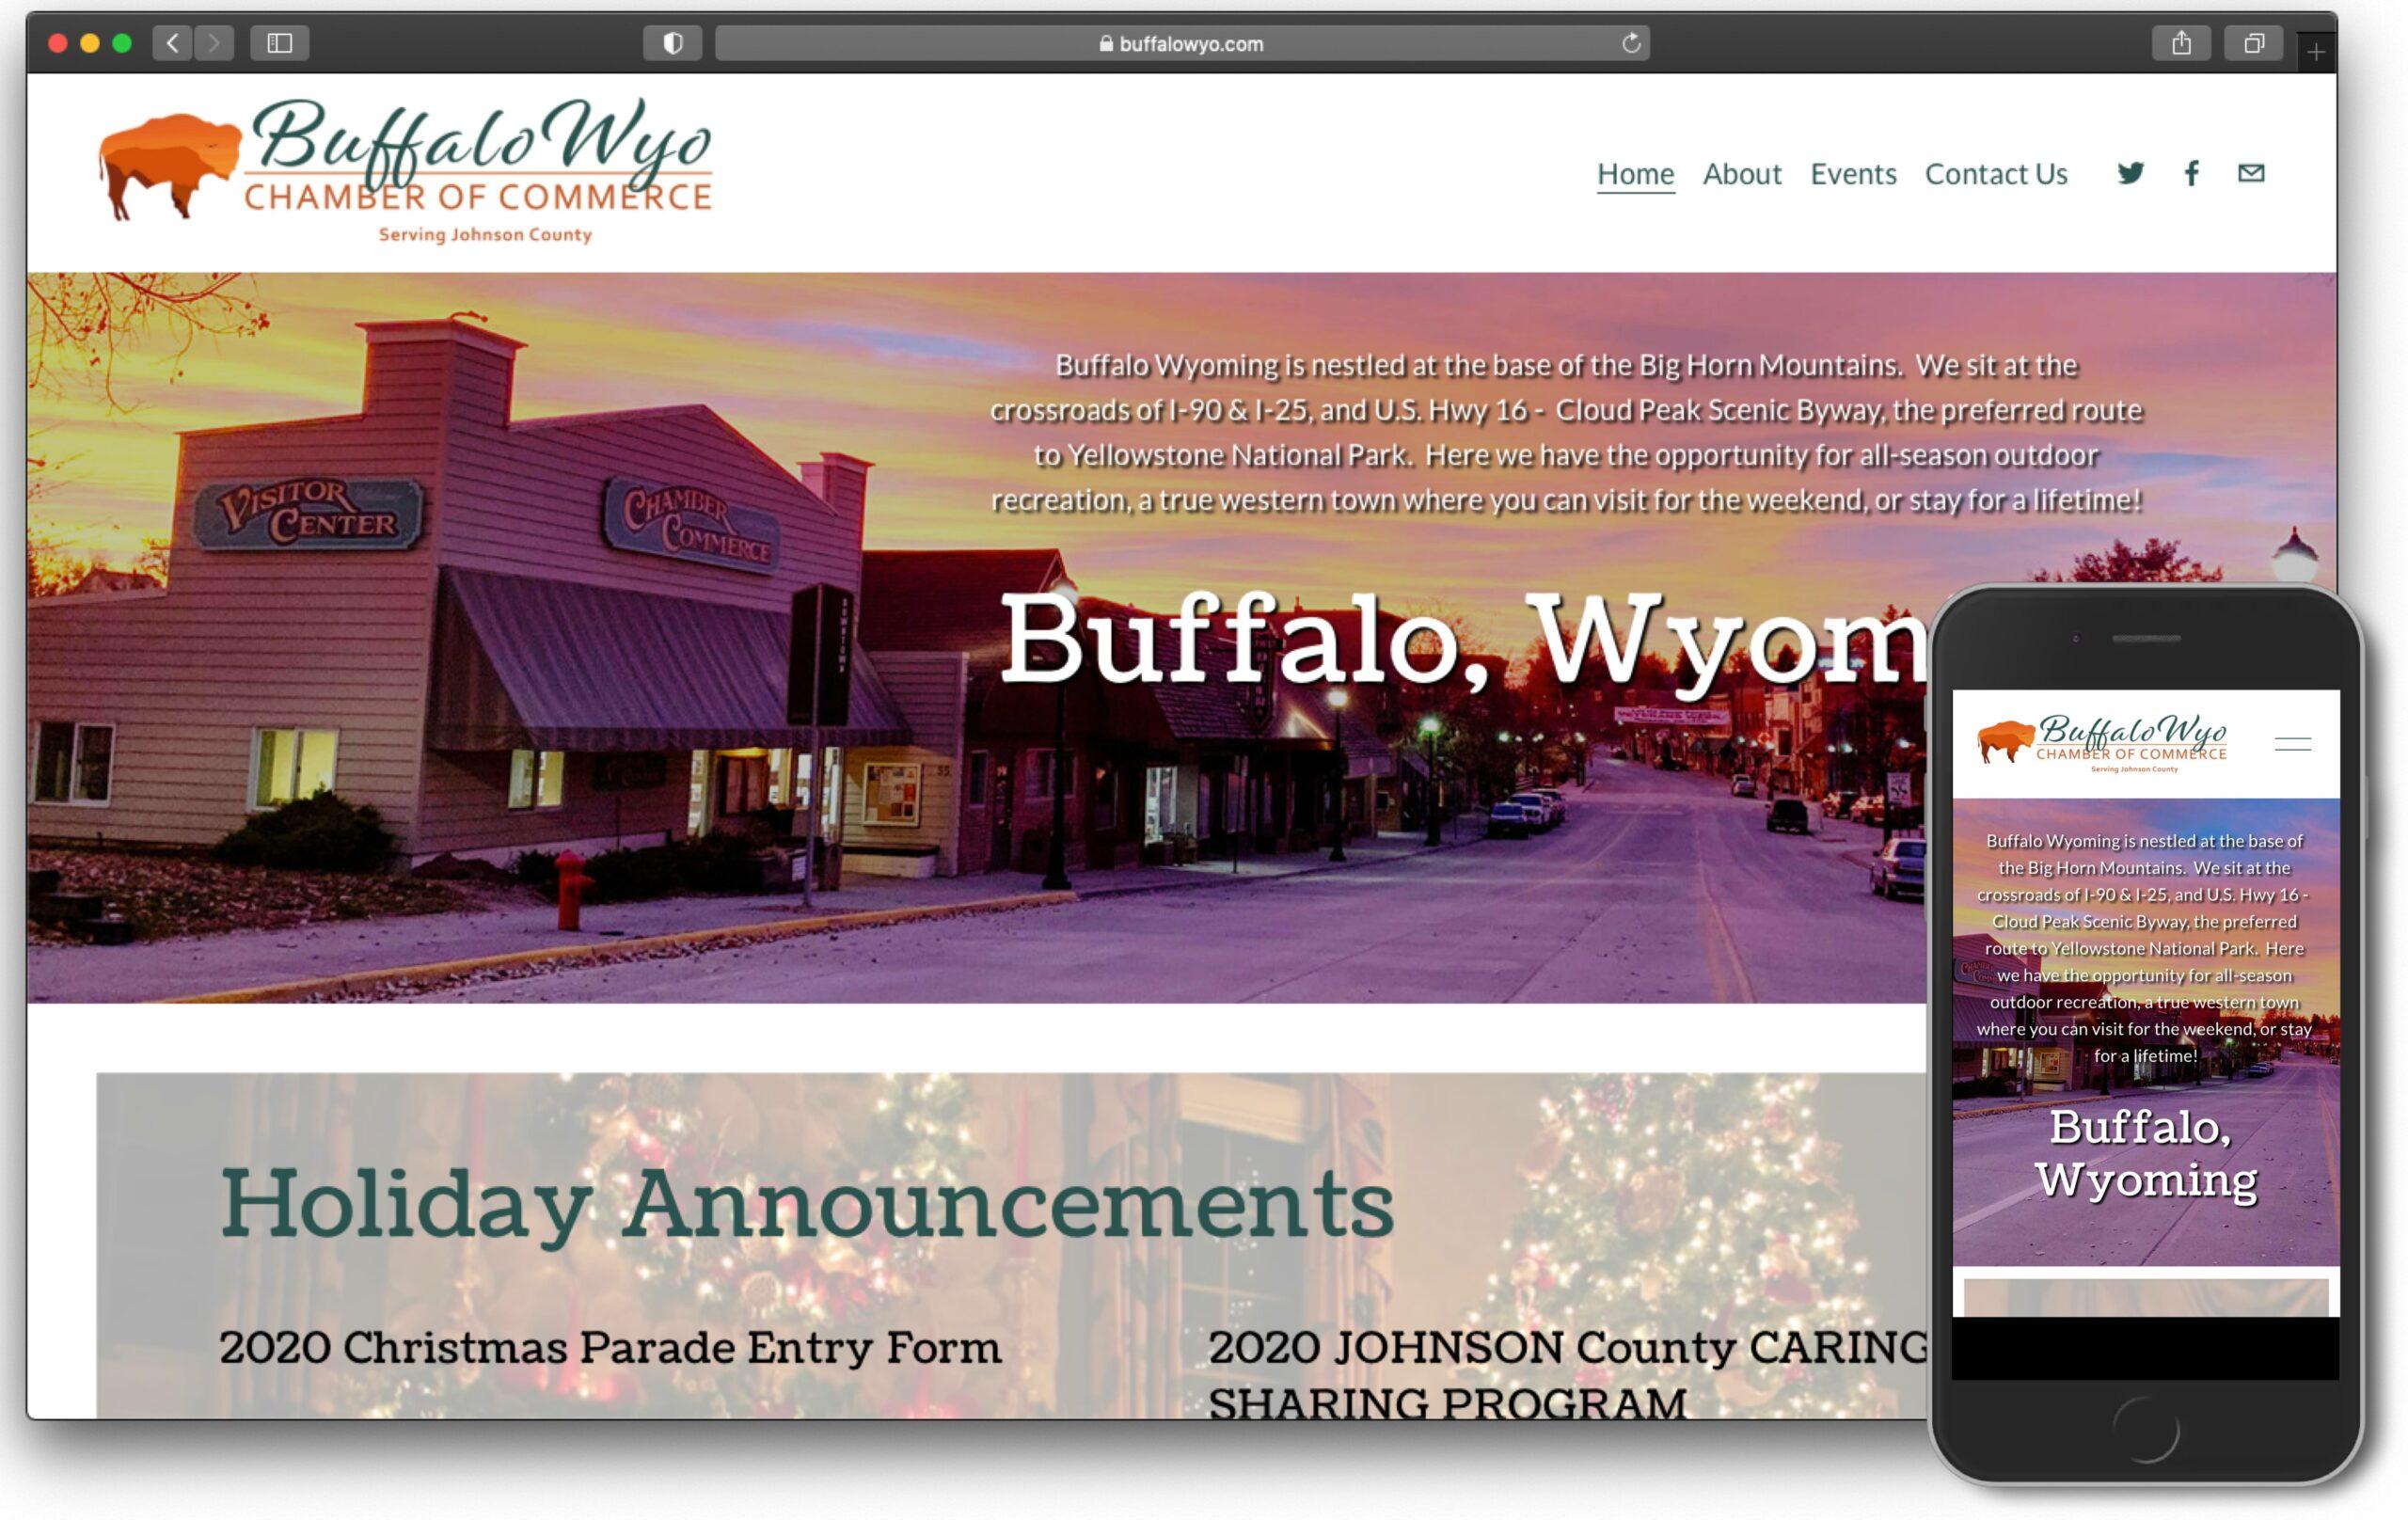 Buffalo Chamber of Commerce Website Screenshot Image